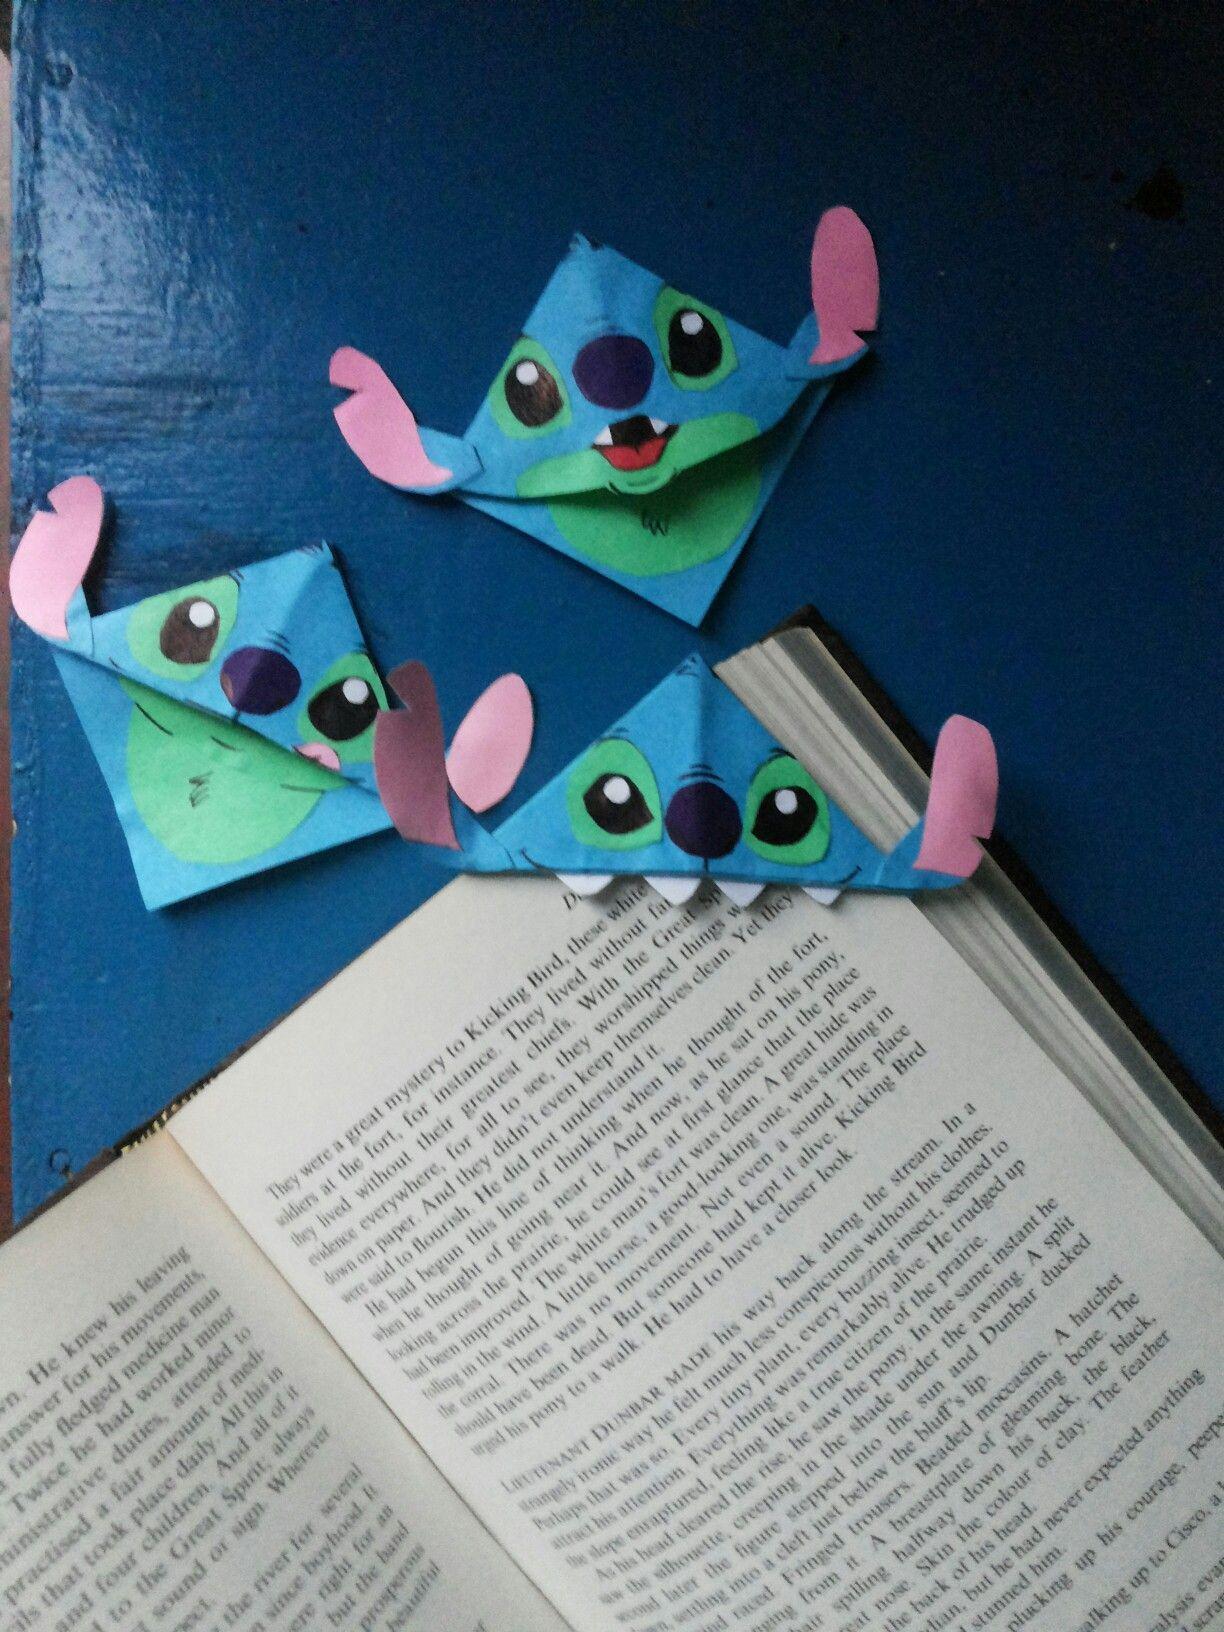 Easy Craft Diy Project At Home Bookmarks Handmade Corner Bookmarks Bookmarks Kids